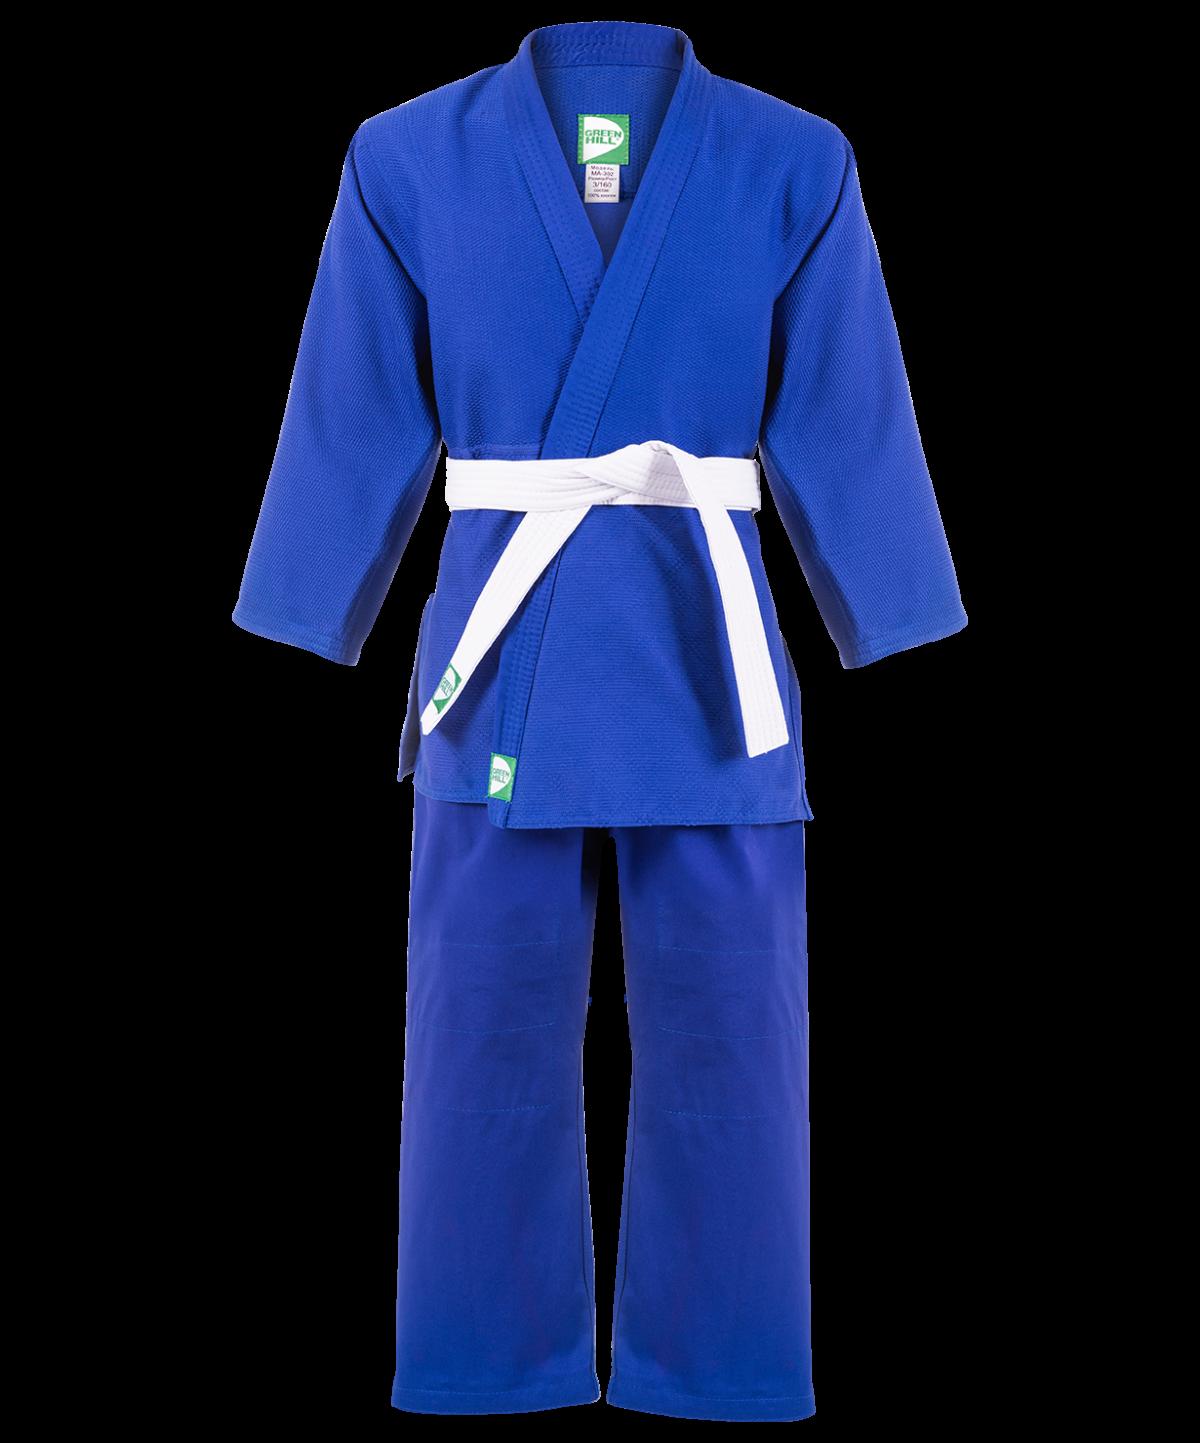 GREEN HILL Кимоно дзюдо 4/170  MA-301: синий - 1